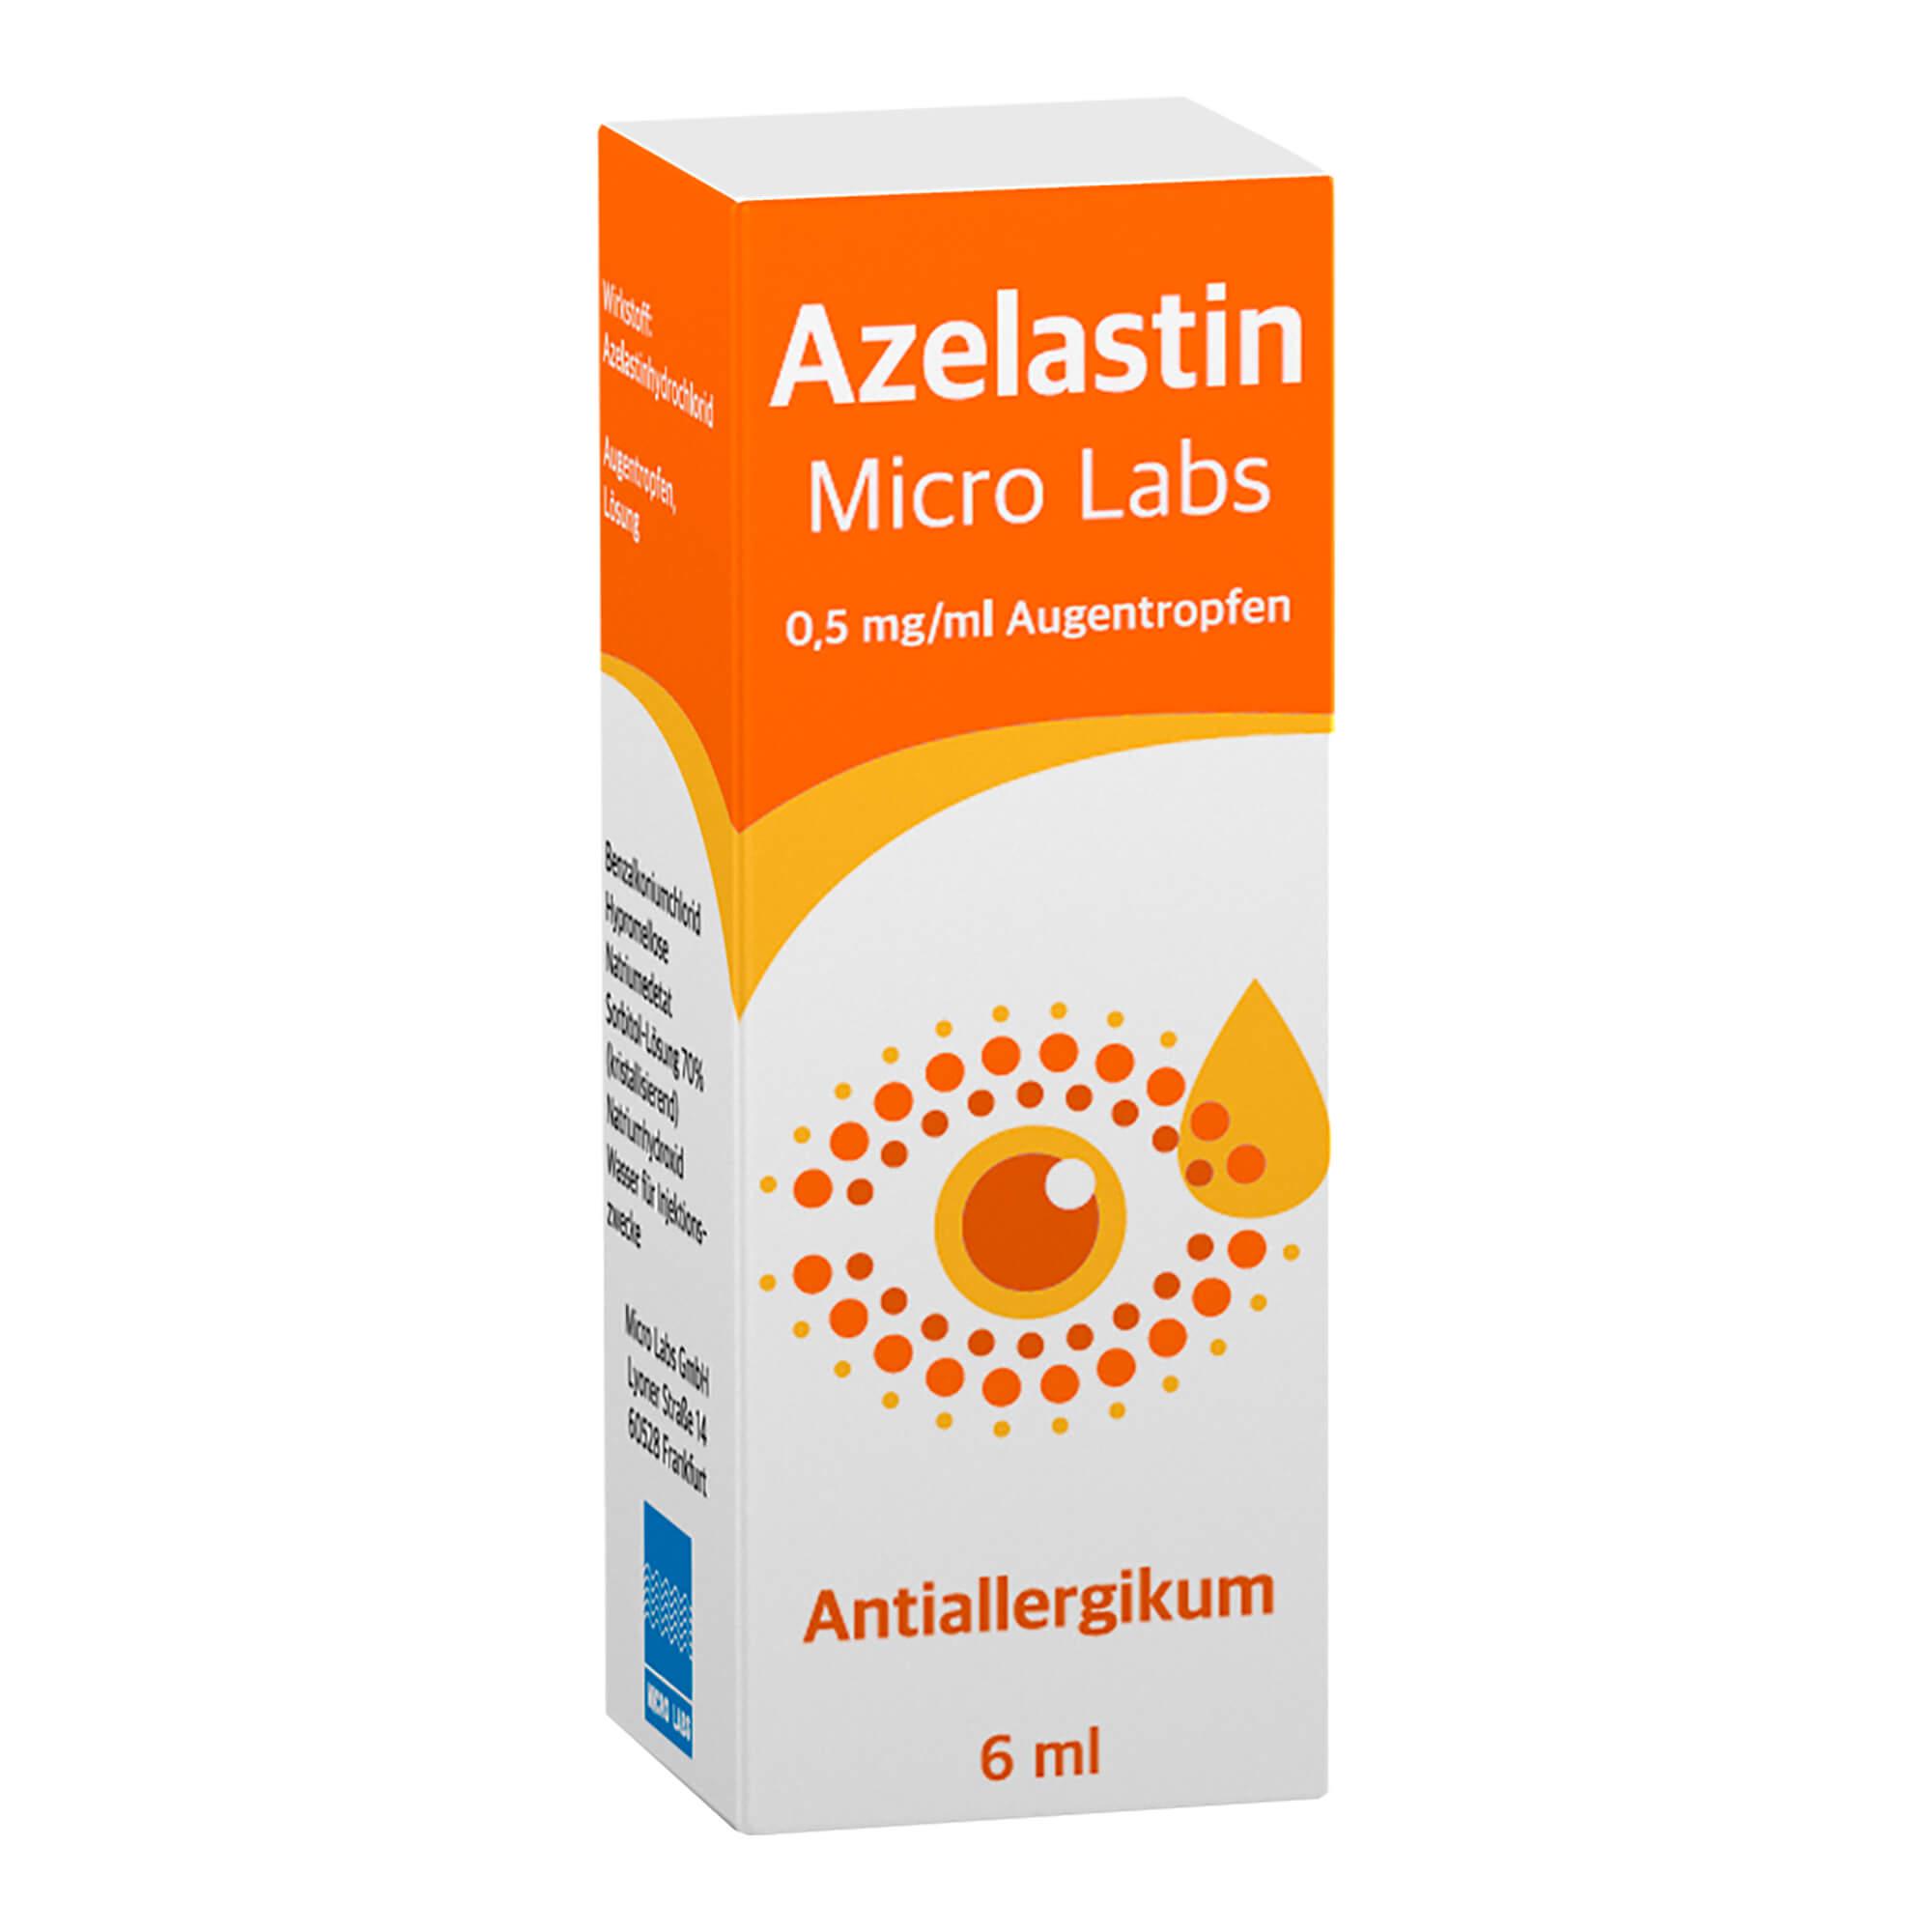 Azelastin Micro Labs 0,5 mg/ml Augentropfen